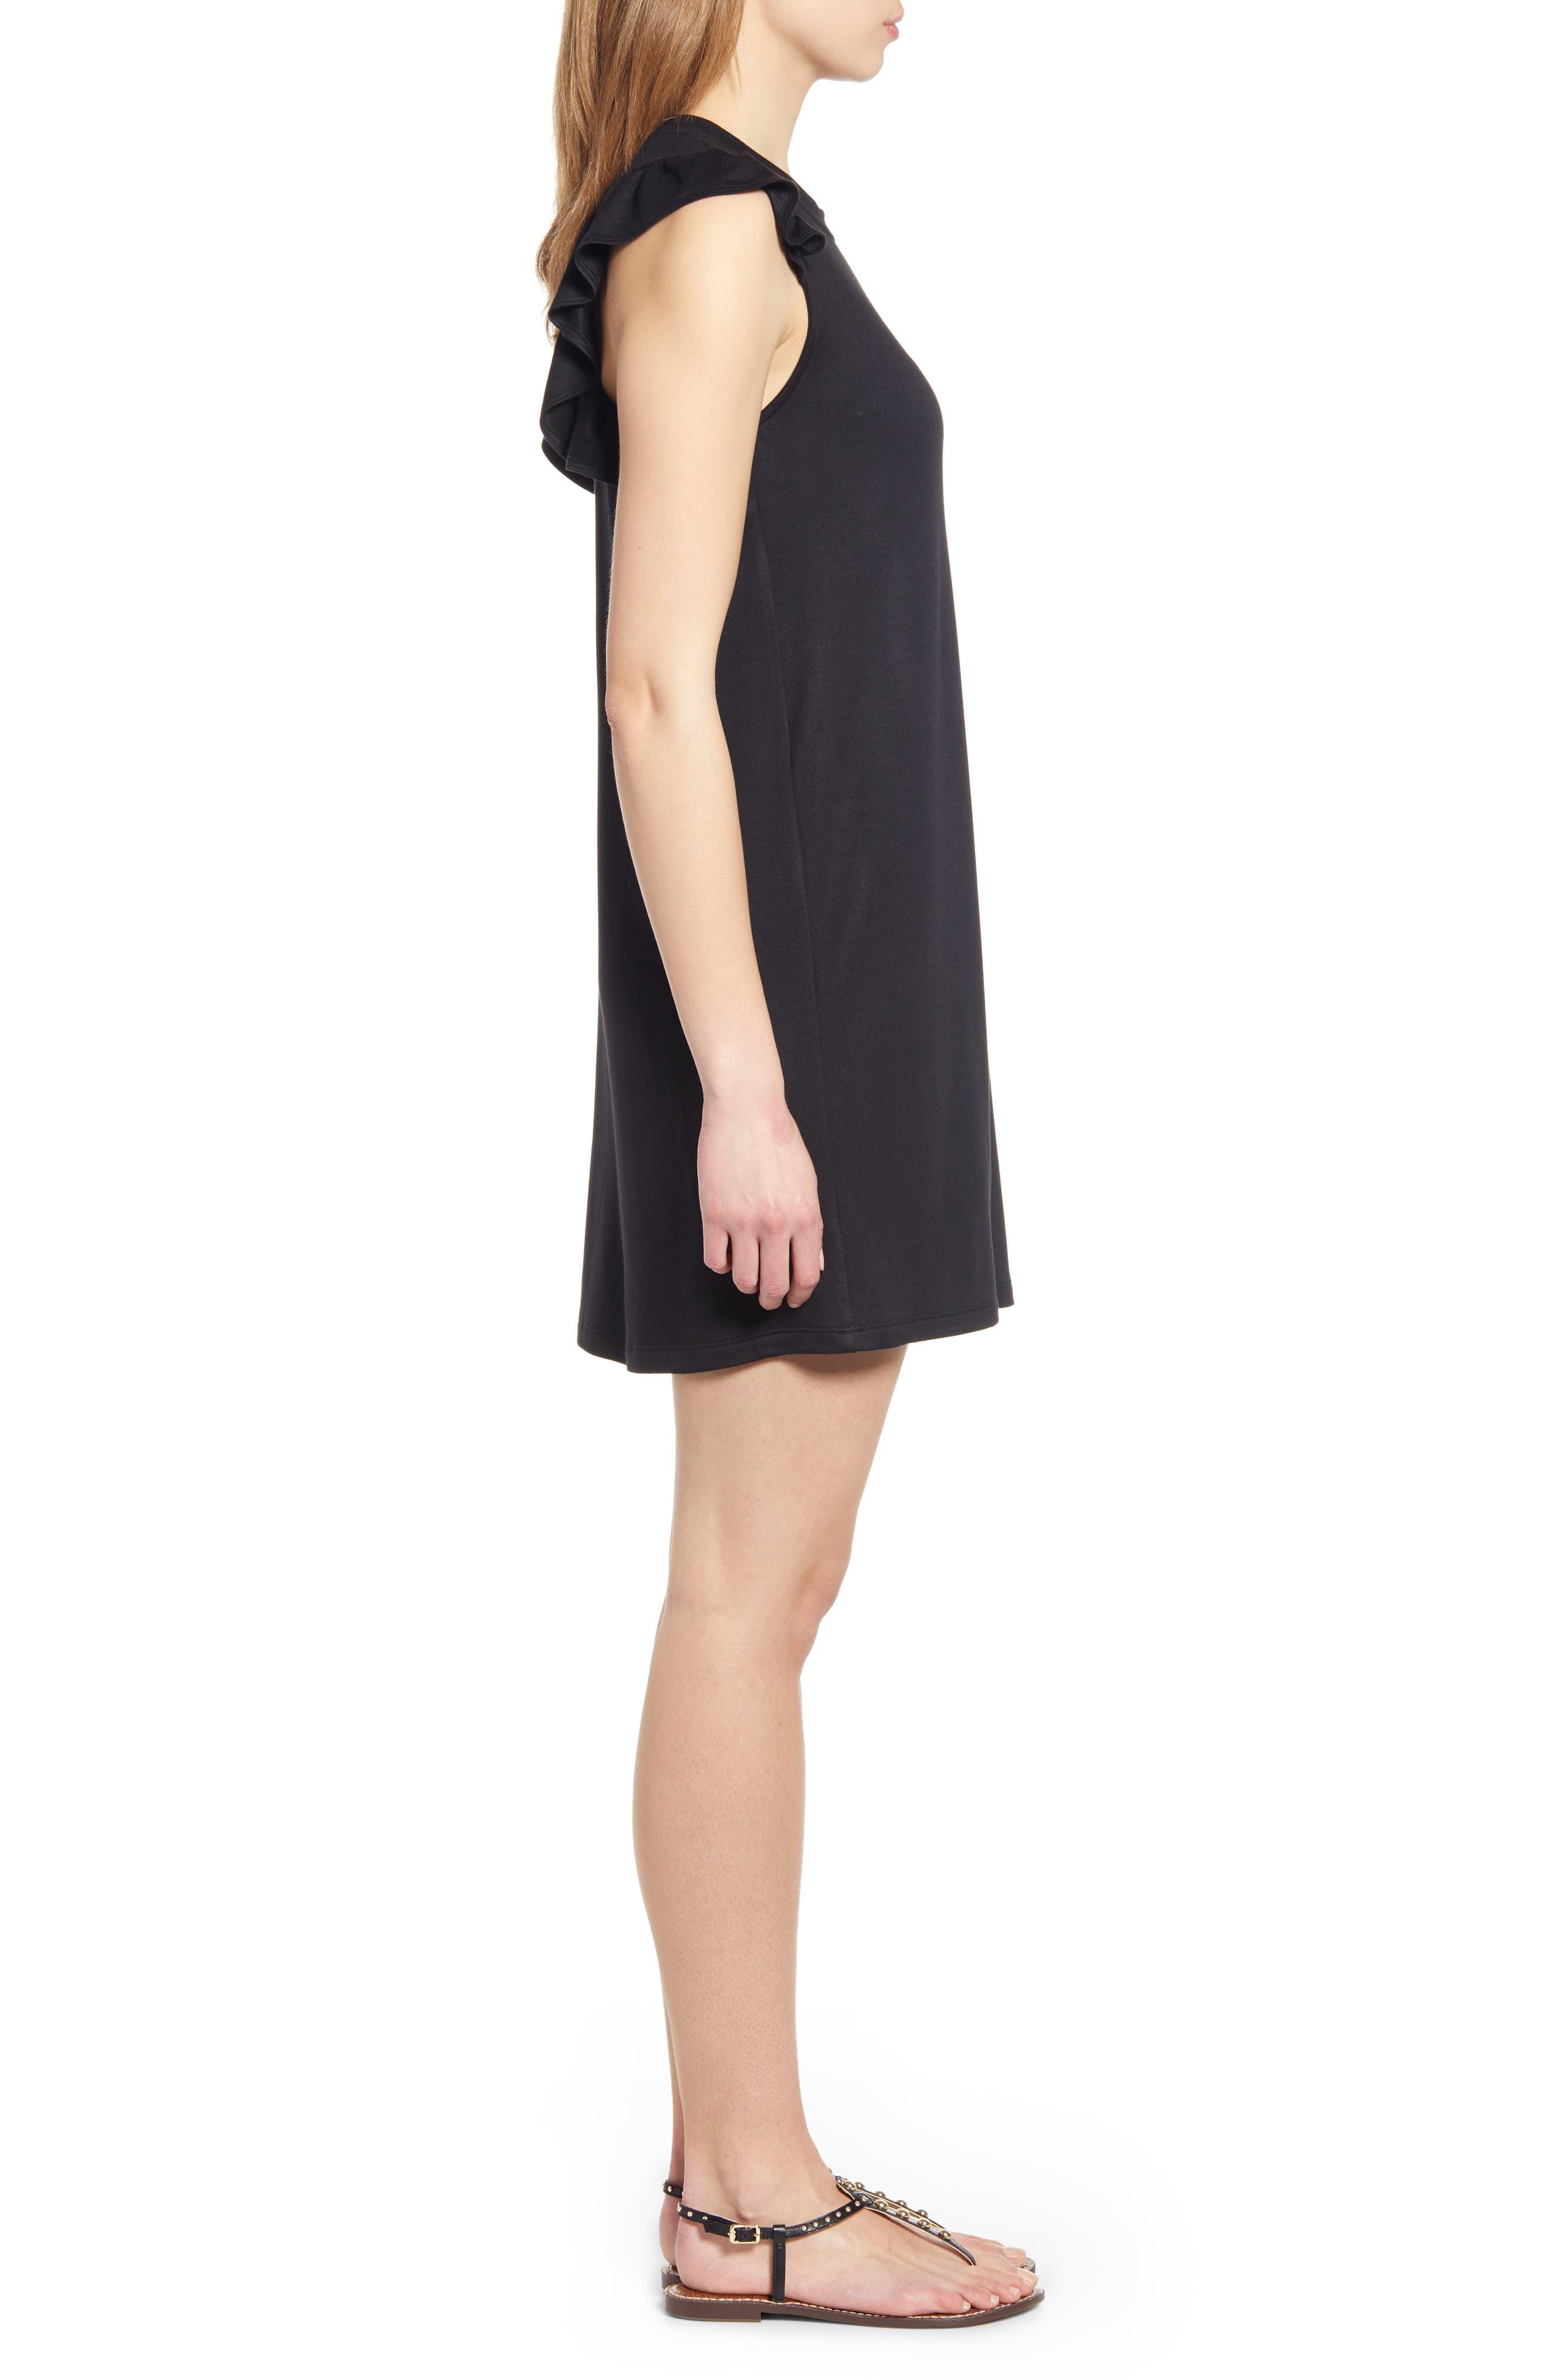 GIBSON, x Hi Sugarplum! Laguna Soft Jersey Ruffle Back T-Shirt Dress, Alternate thumbnail 4, color, BLACK